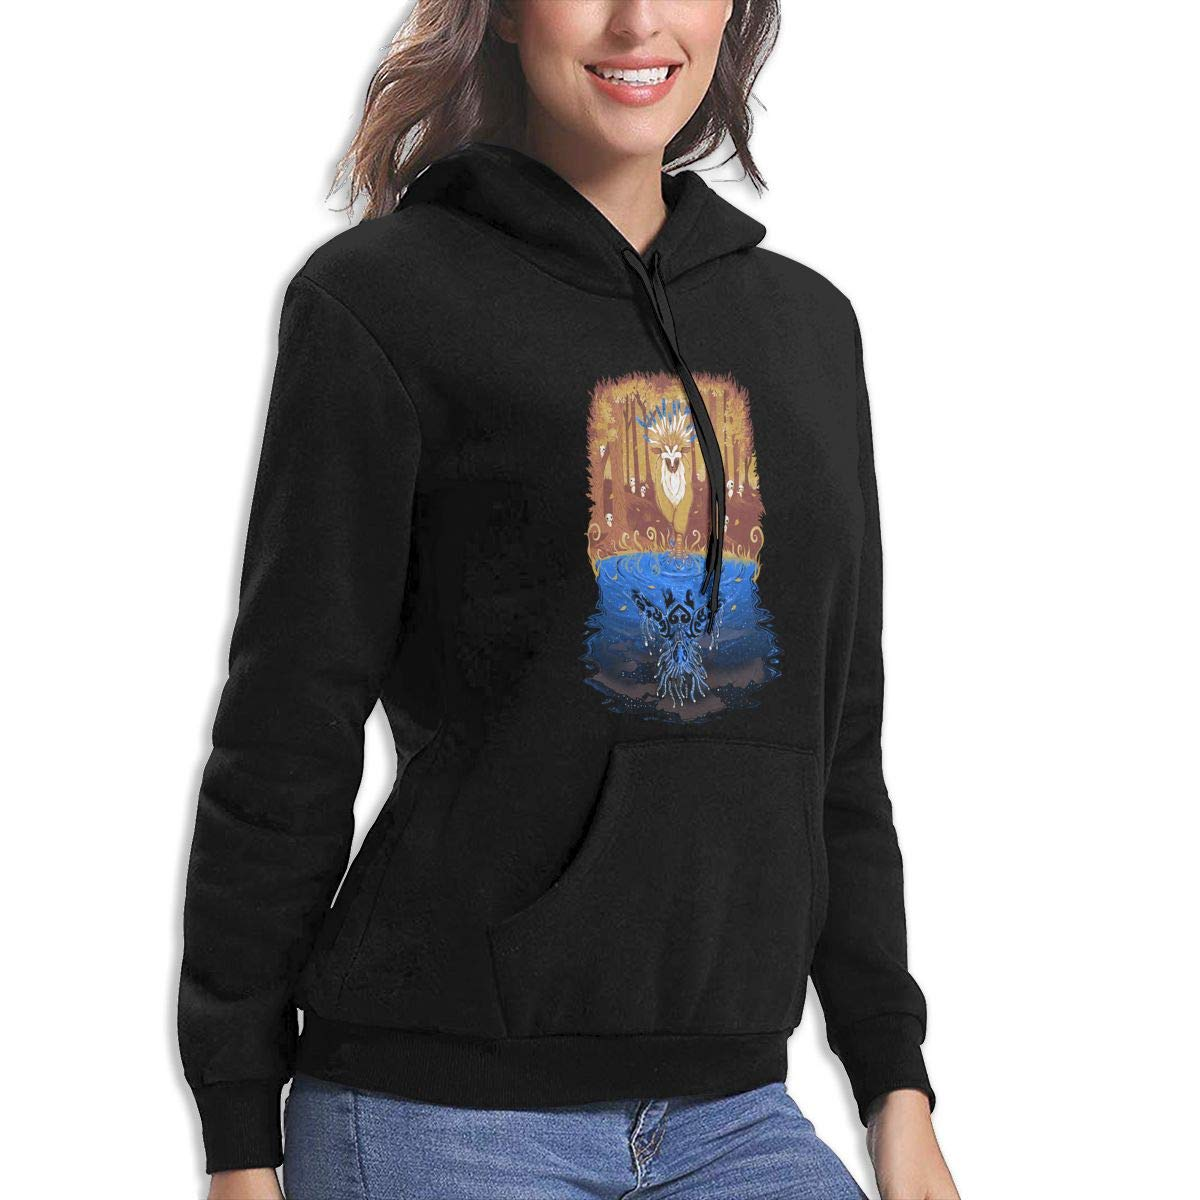 ZALOA Autumn Forest Spirit,Print Funny Womens Sports Hooded Jacket Hoodies Pocket Black